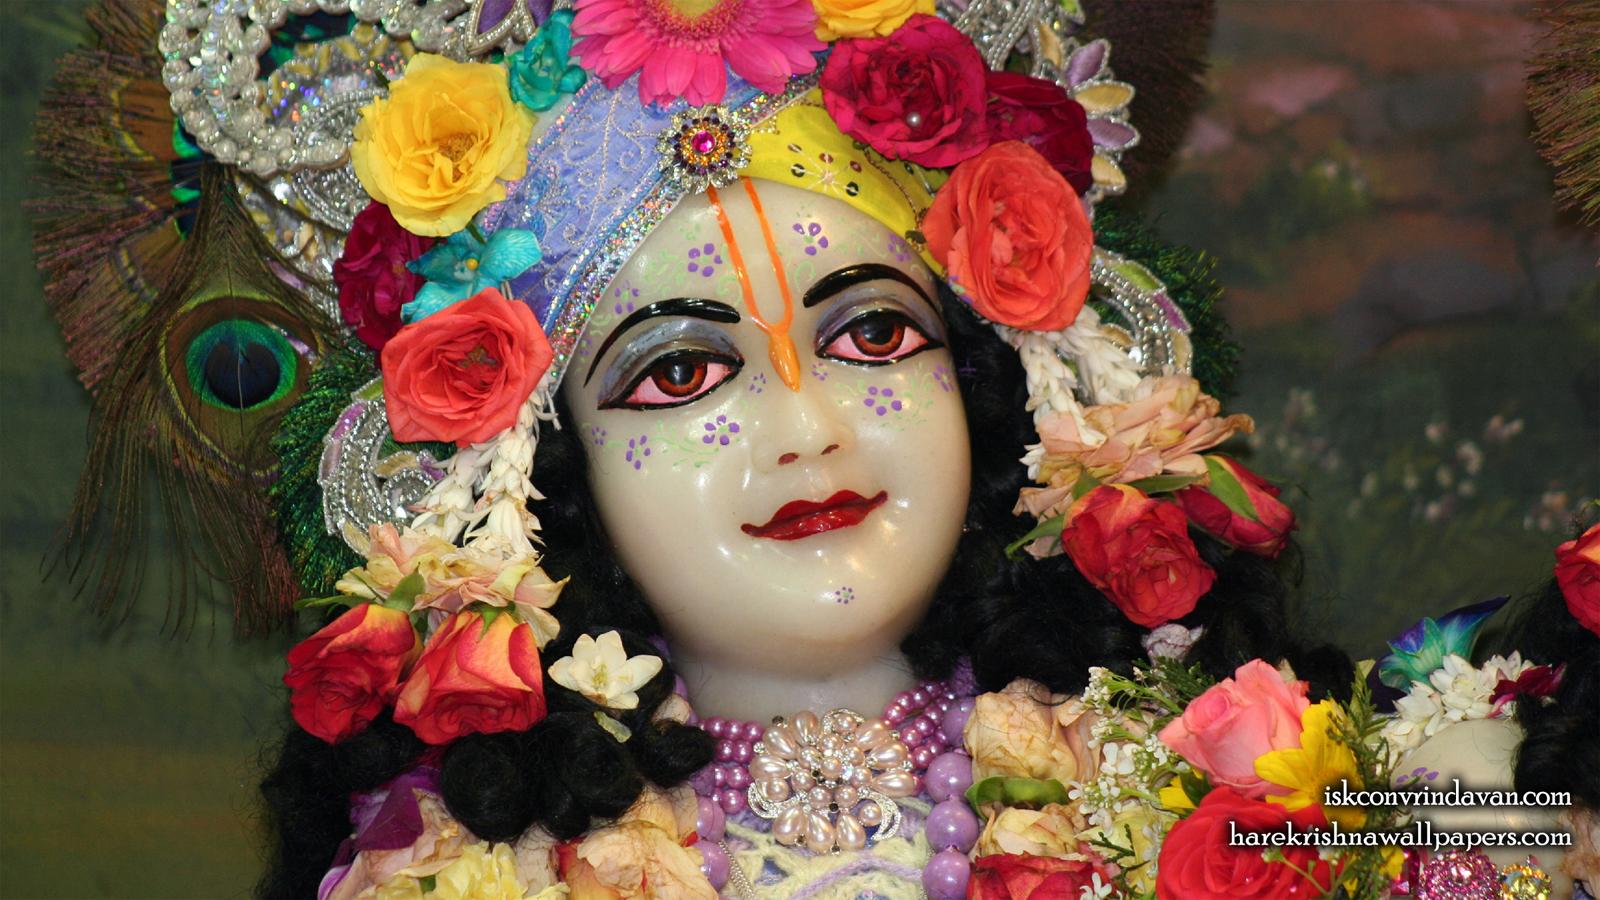 Sri Balaram Close up Wallpaper (008) Size 1600x900 Download